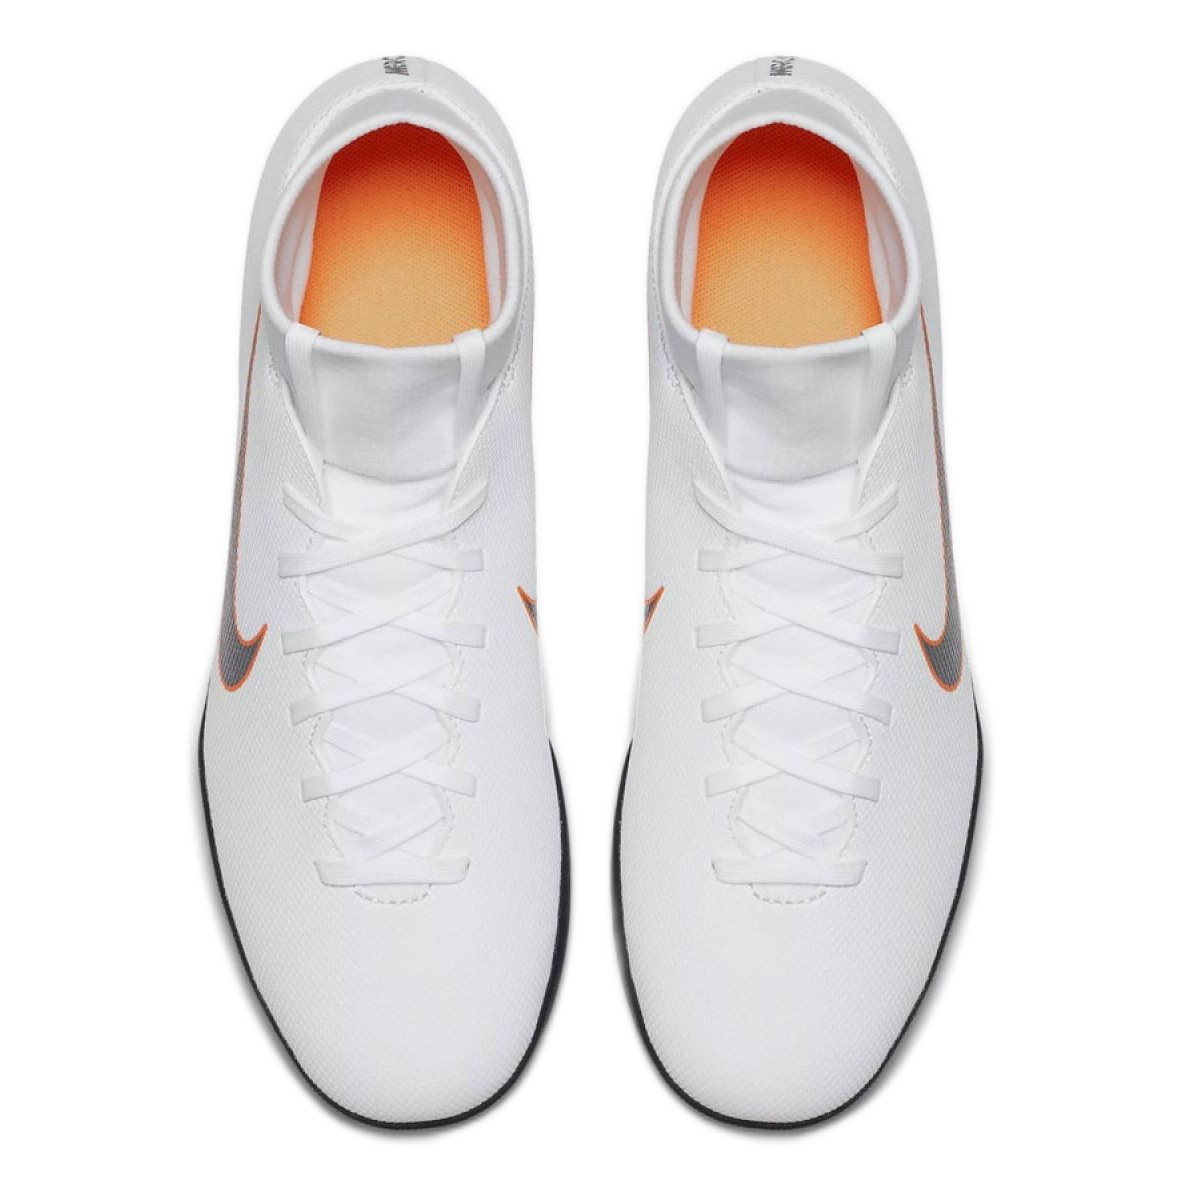 De Zapatos Fútbol Nike AH7372 107 M Tf Club 6 SuperflyX